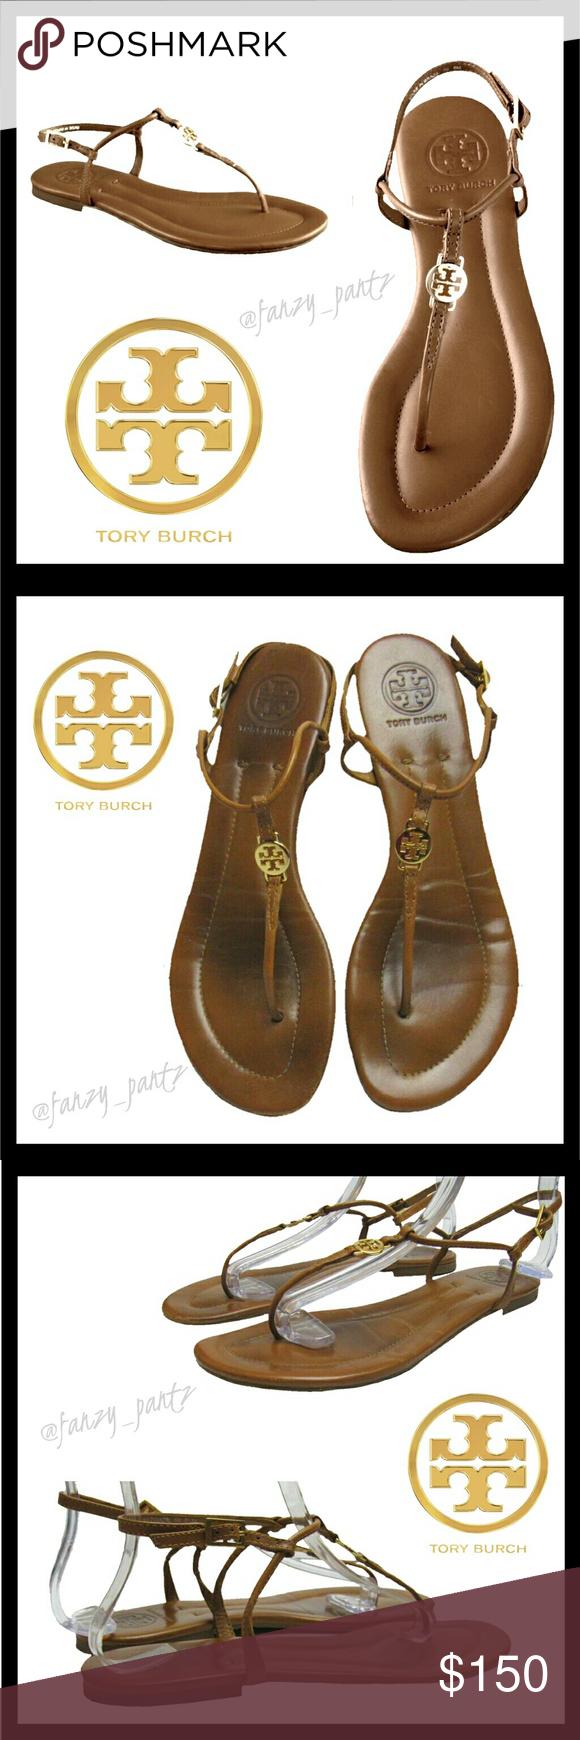 ff854bfb0fe88 Tory Burch Emmy brown gold logo sandals 8.5 Tory Burch  Emmy  logo Thong